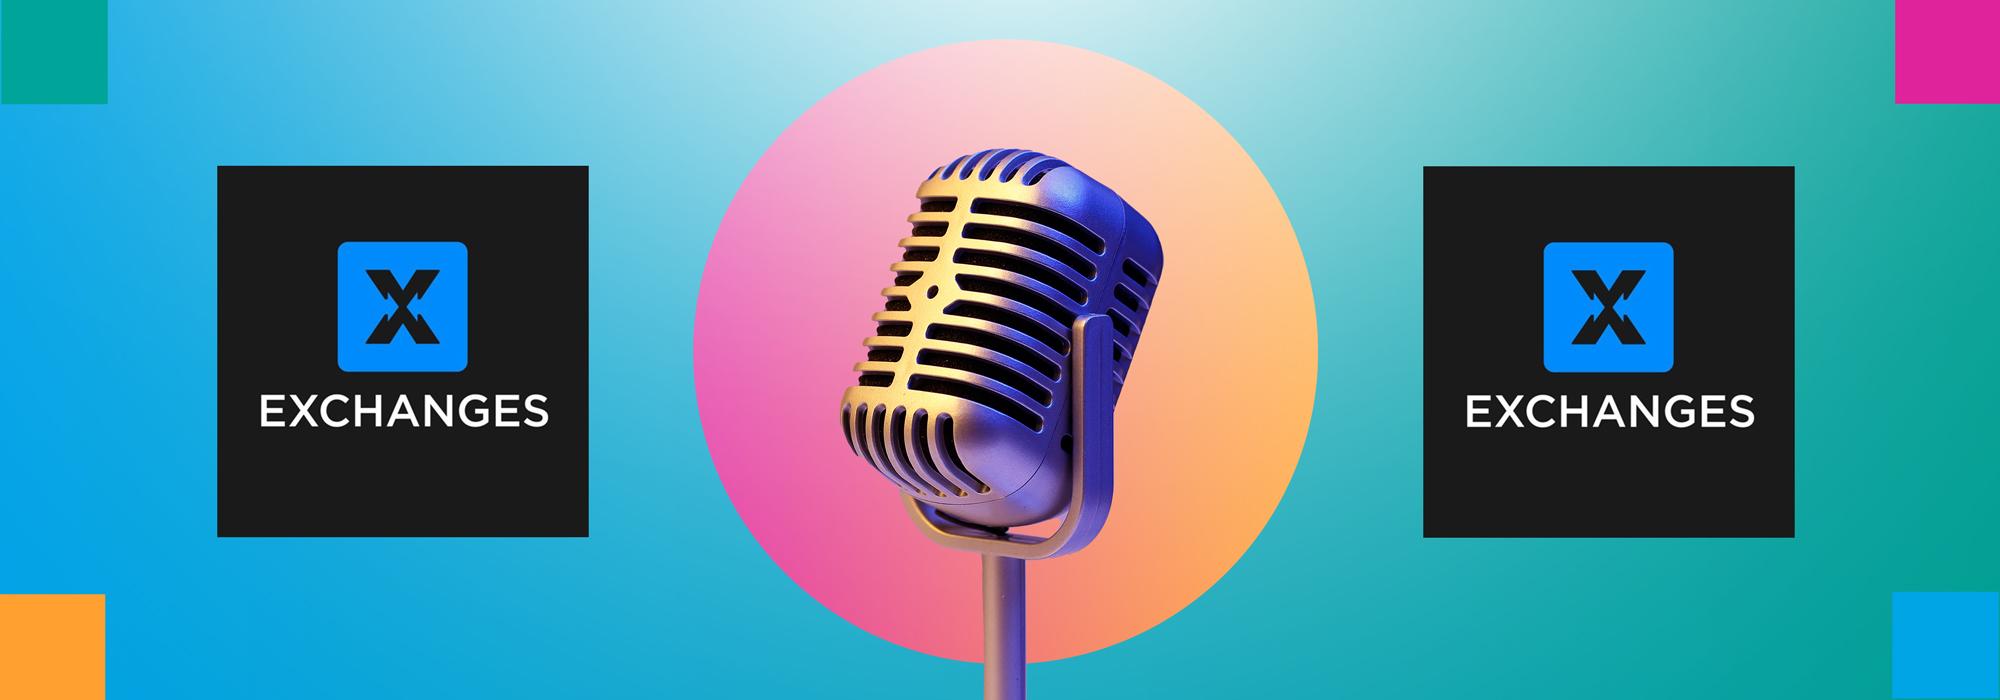 Exchanges Podcast mit Mikrofon